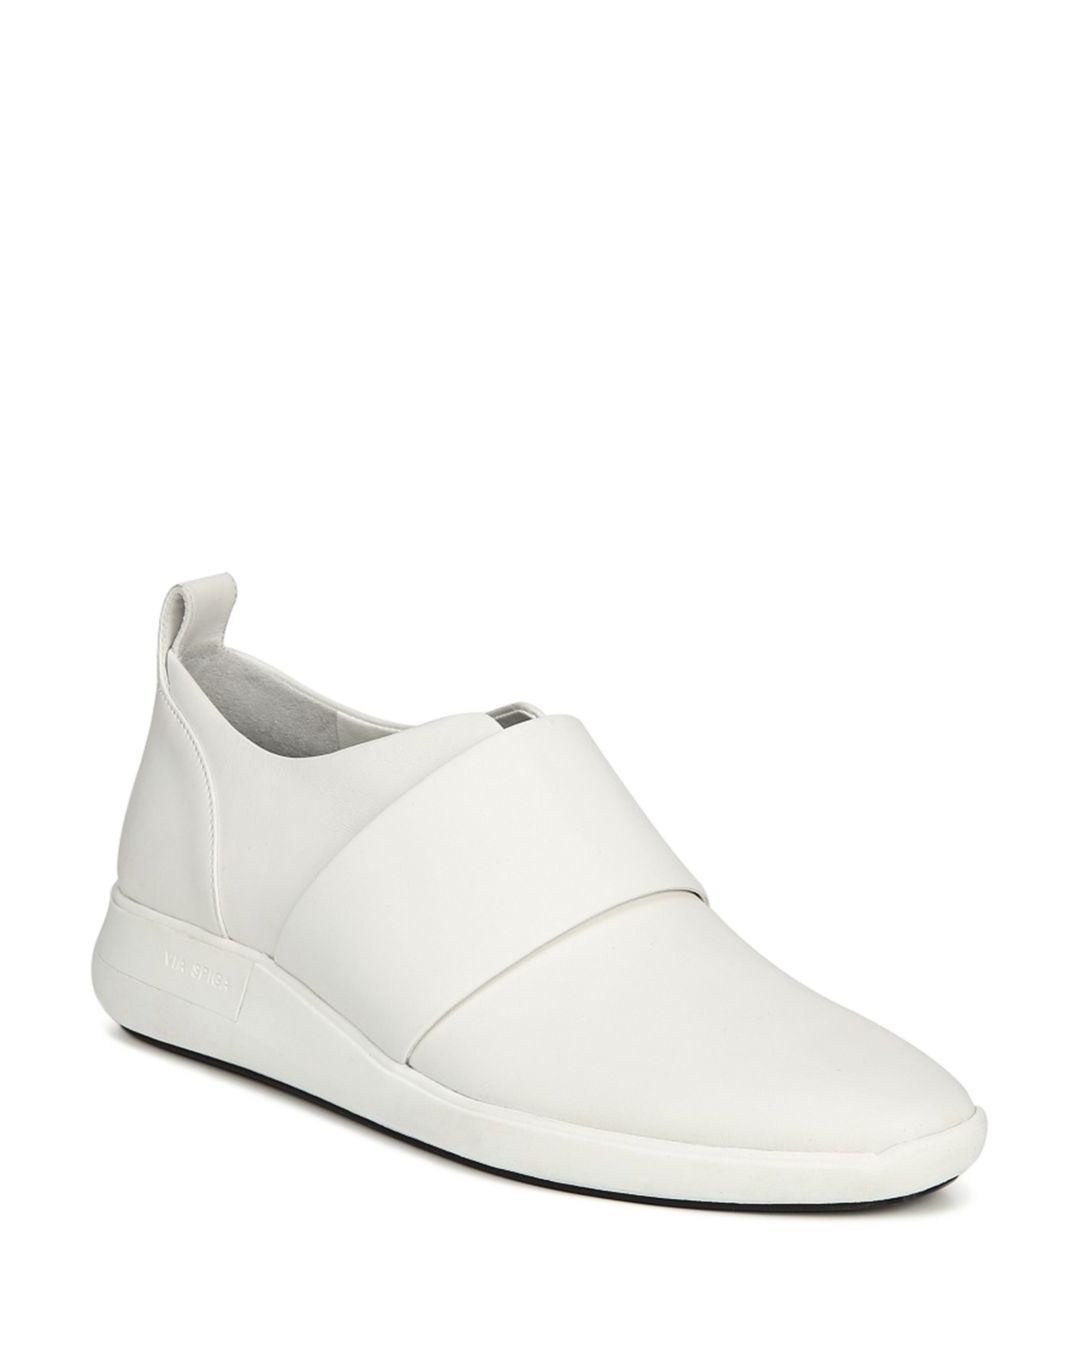 Https Clothing Npeal Cashmere Milano Fur Gilet 5 2018 D Island Shoes Style Hikers Dm Mens Leather Cokelat Via Spiga Porcelain Womens Marlon Slip On Sneakersjpeg